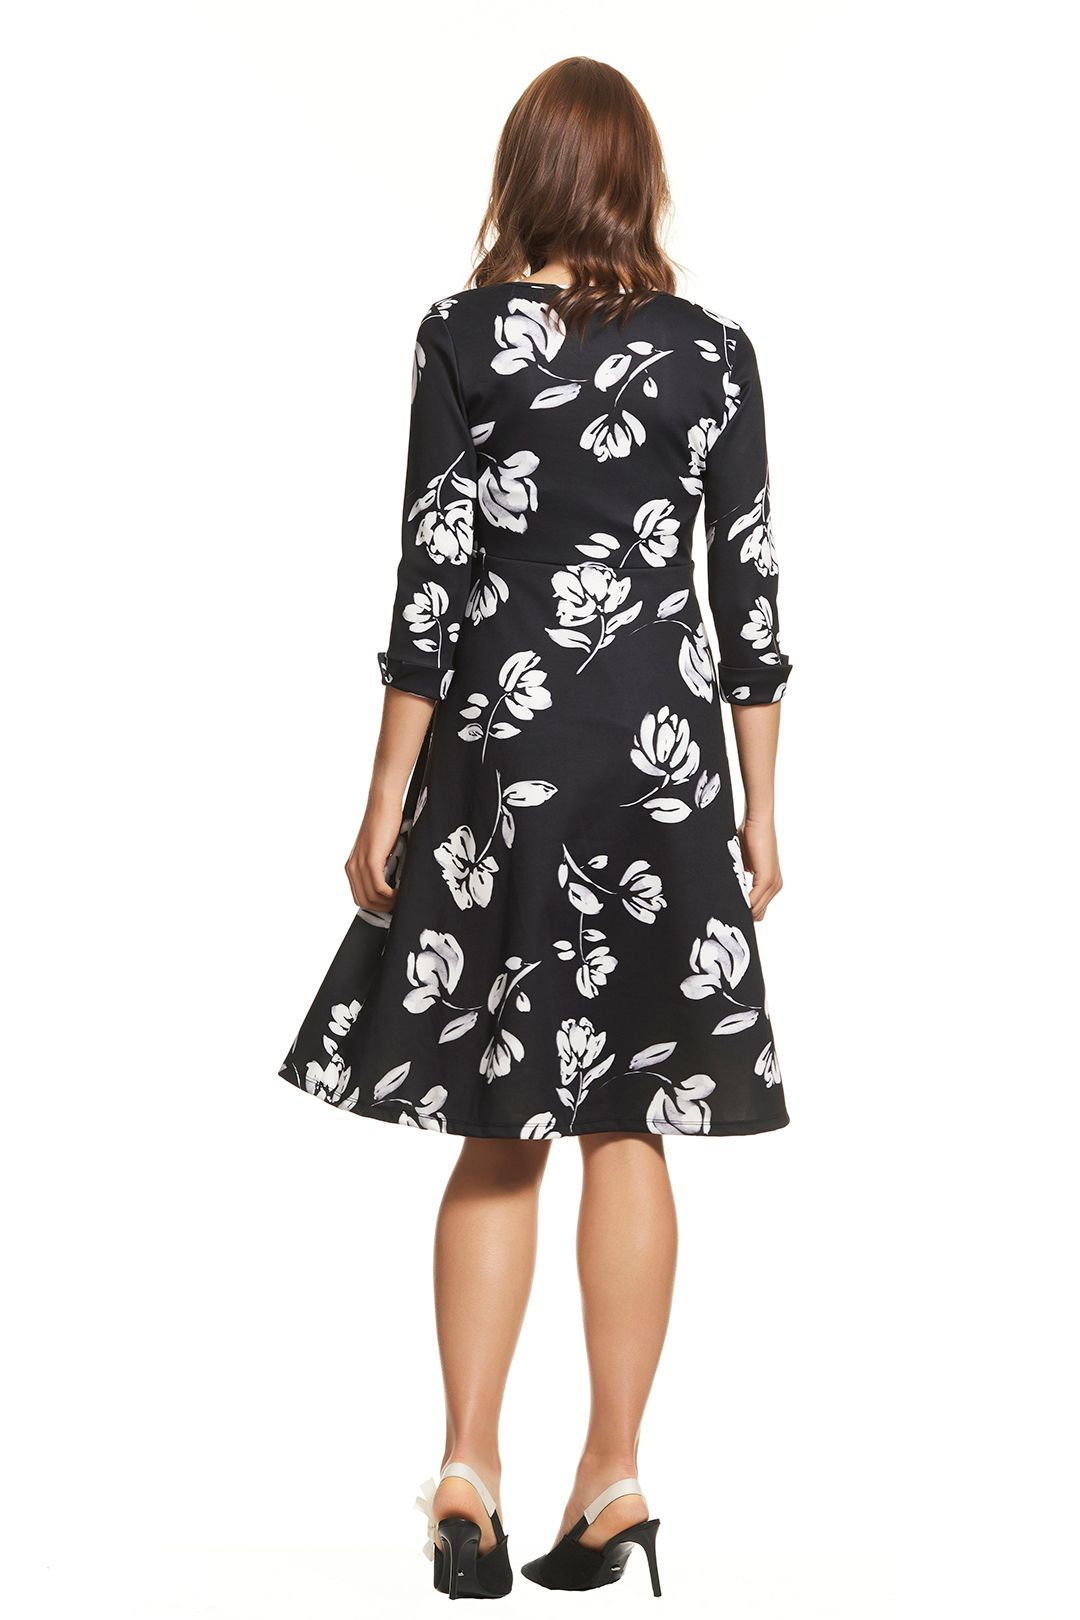 Soon Maternity-Meghan-Swing-Dress-Black-Floral-Back